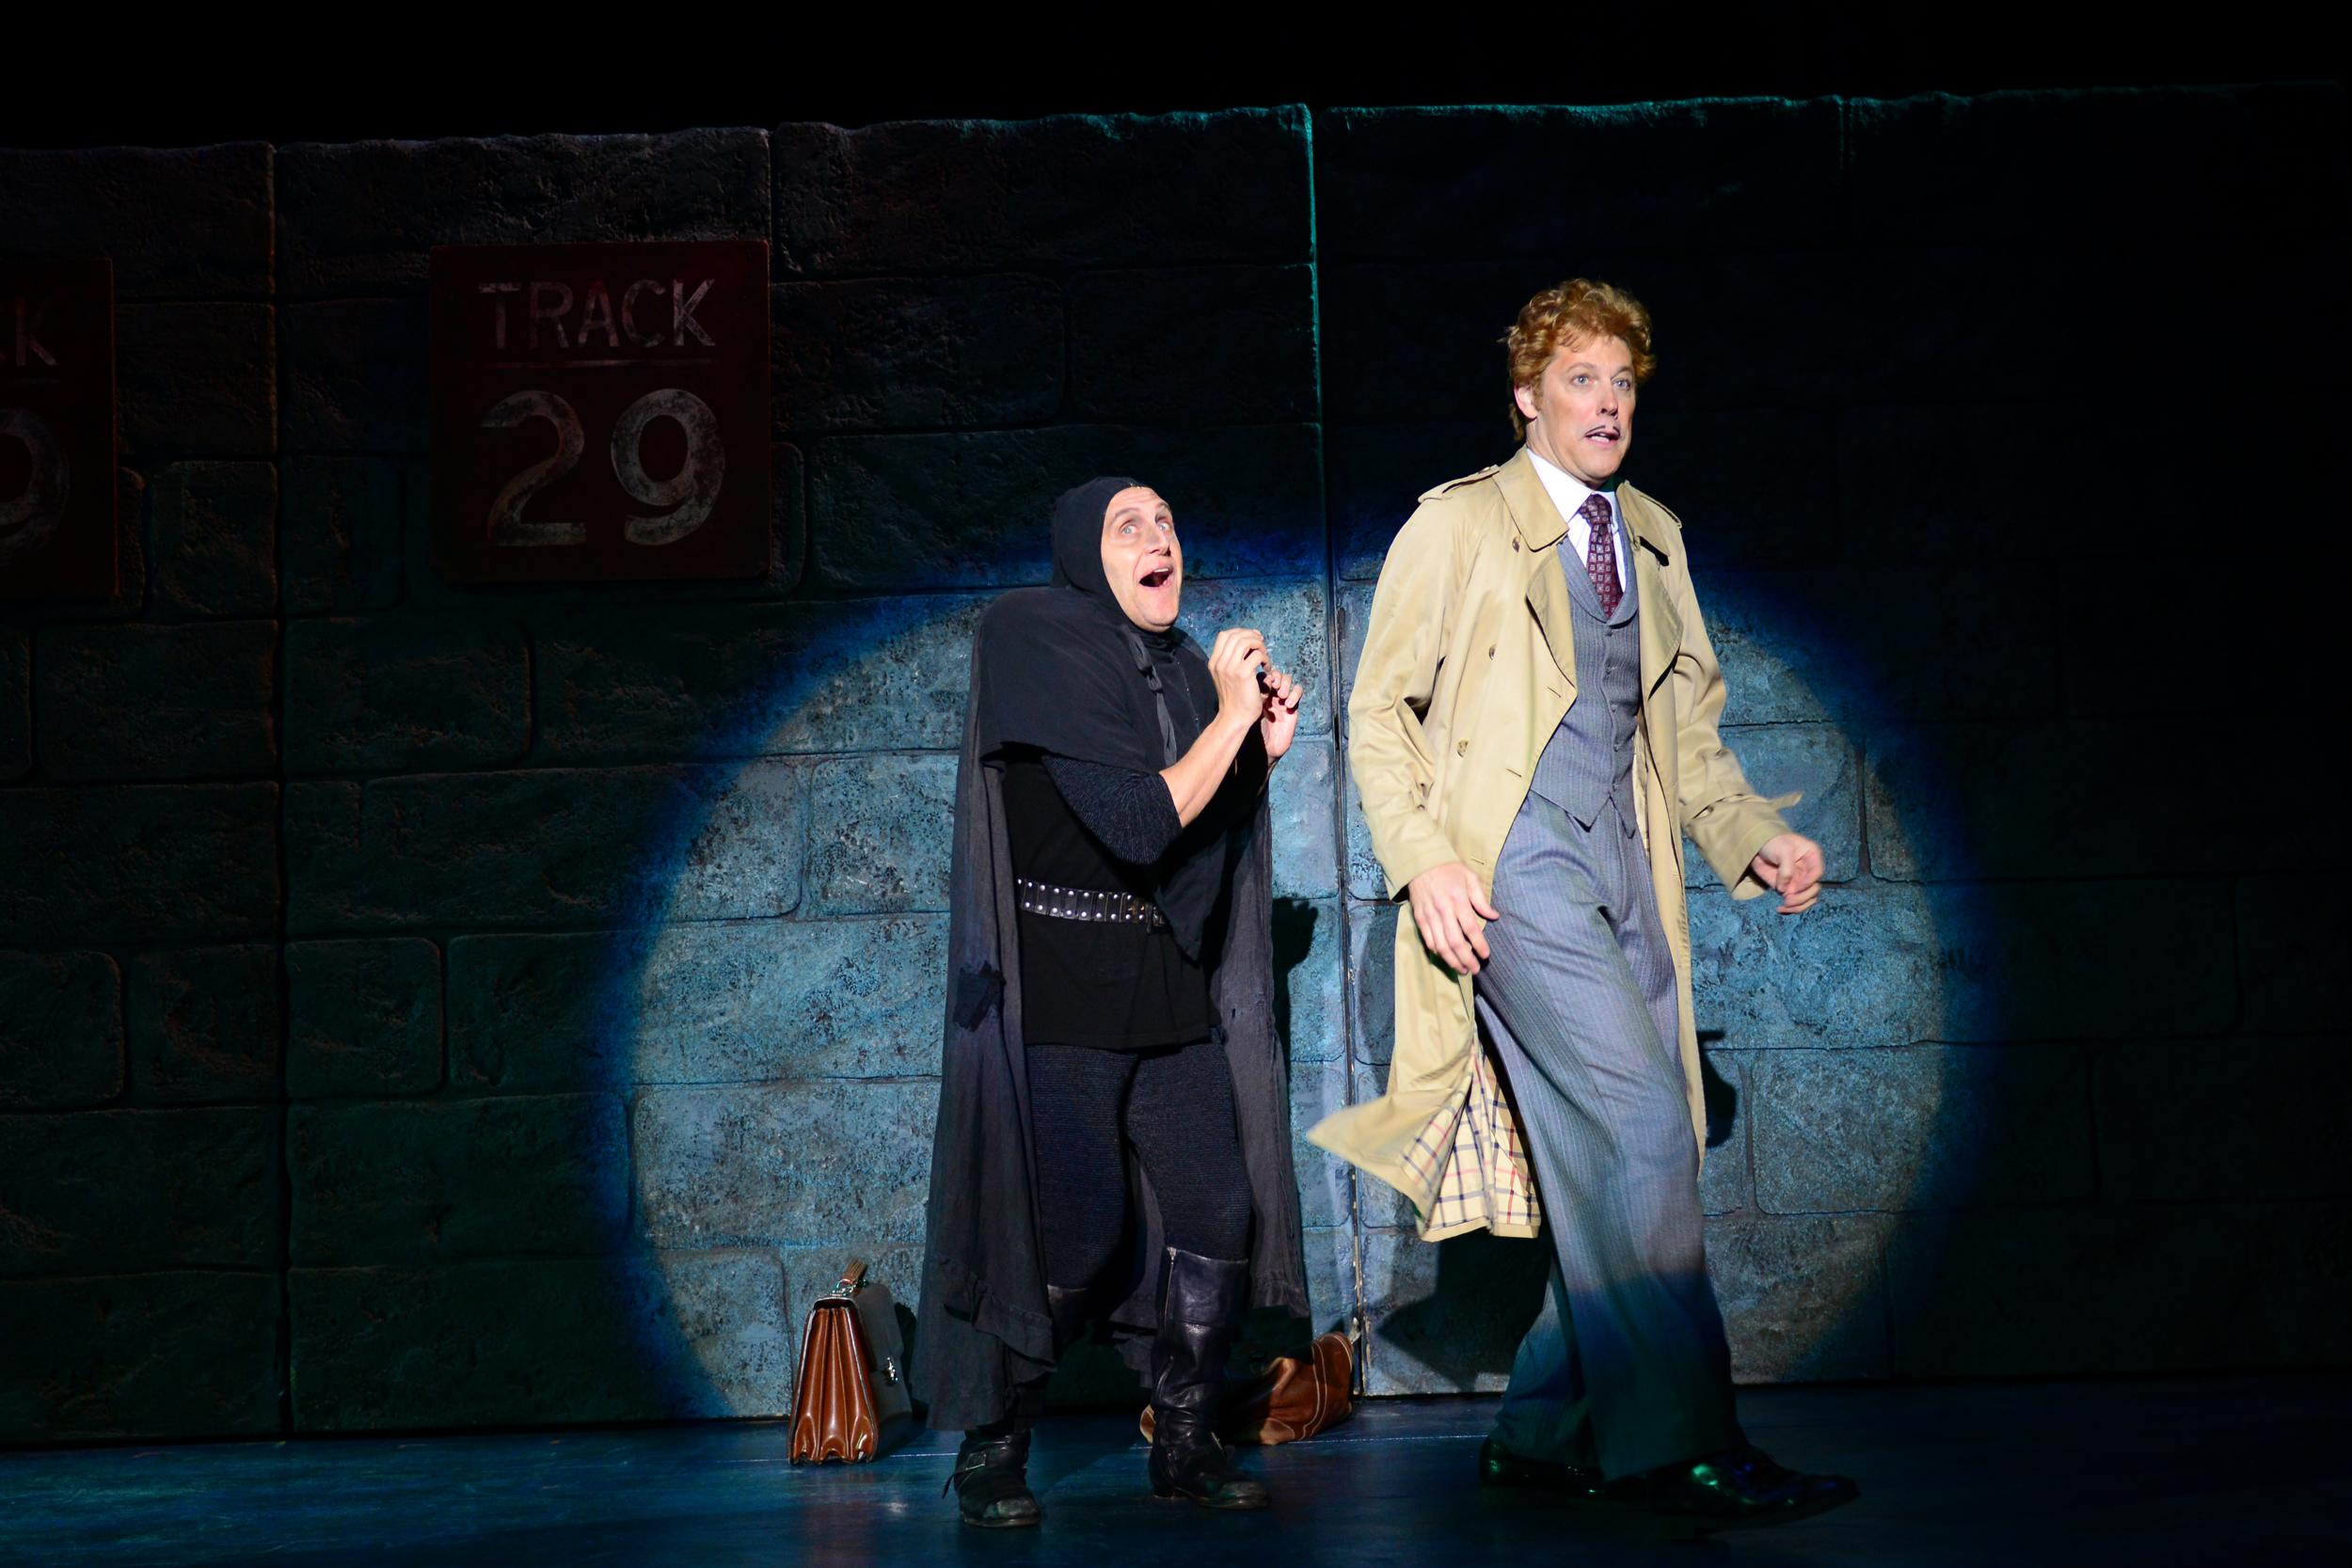 2013_OP_Young-Frankenstein_Nathan-Klau_as_Igor_John-Bolton_as_Frankenstein_photo-by_Gary-Ng_RGB.jpg